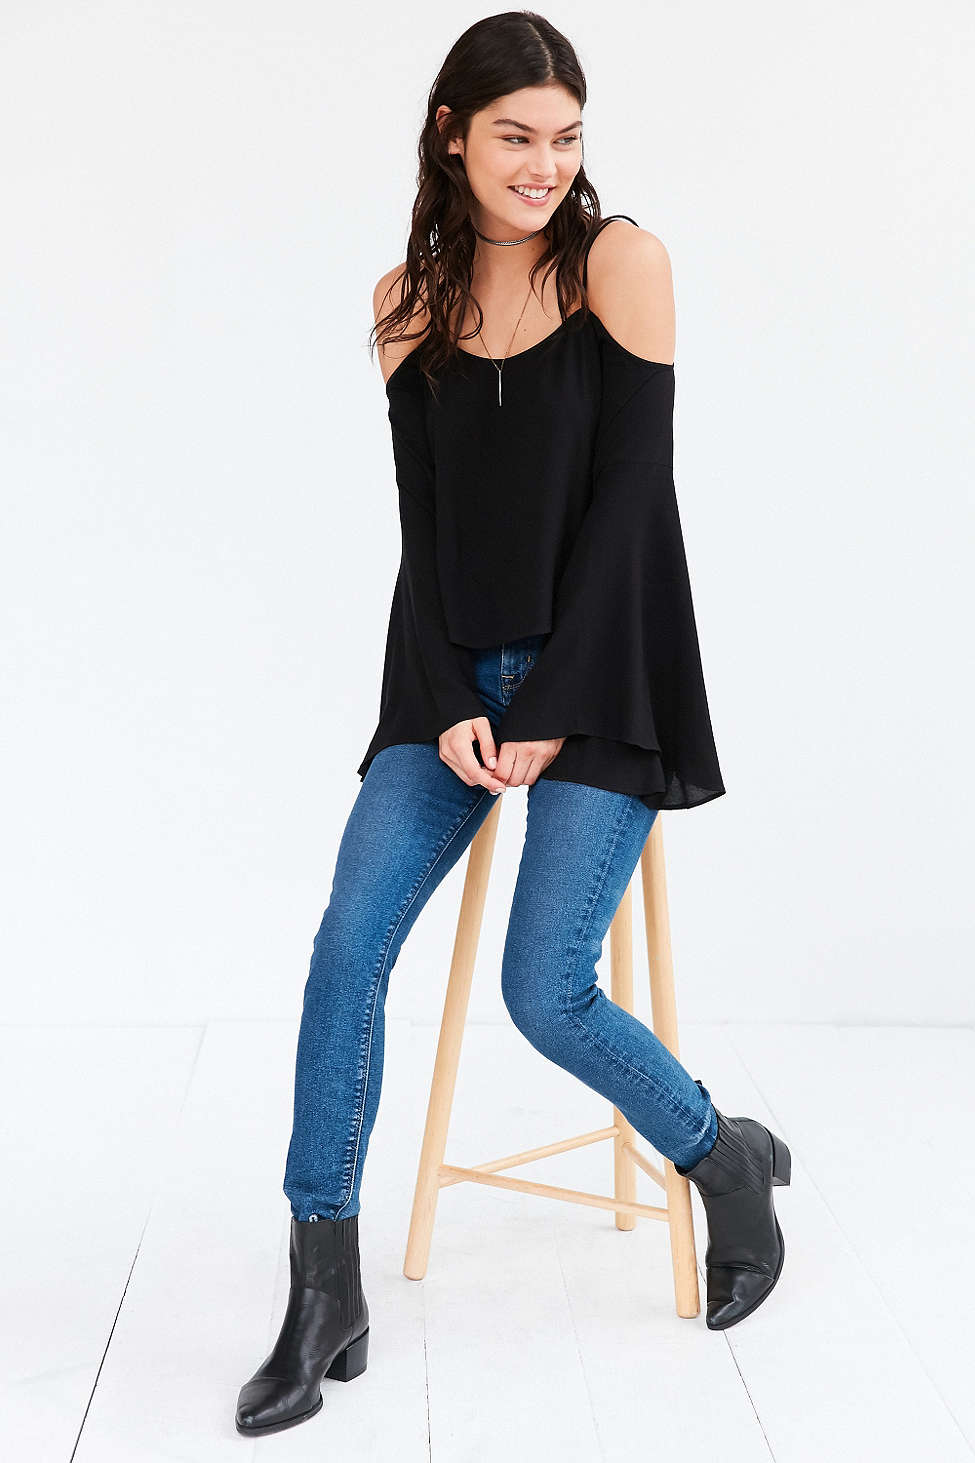 blue-med-skinny-jeans-black-top-blouse-wear-outfit-fashion-fall-winter-black-shoe-booties-offshoulder-brun-weekend.jpg